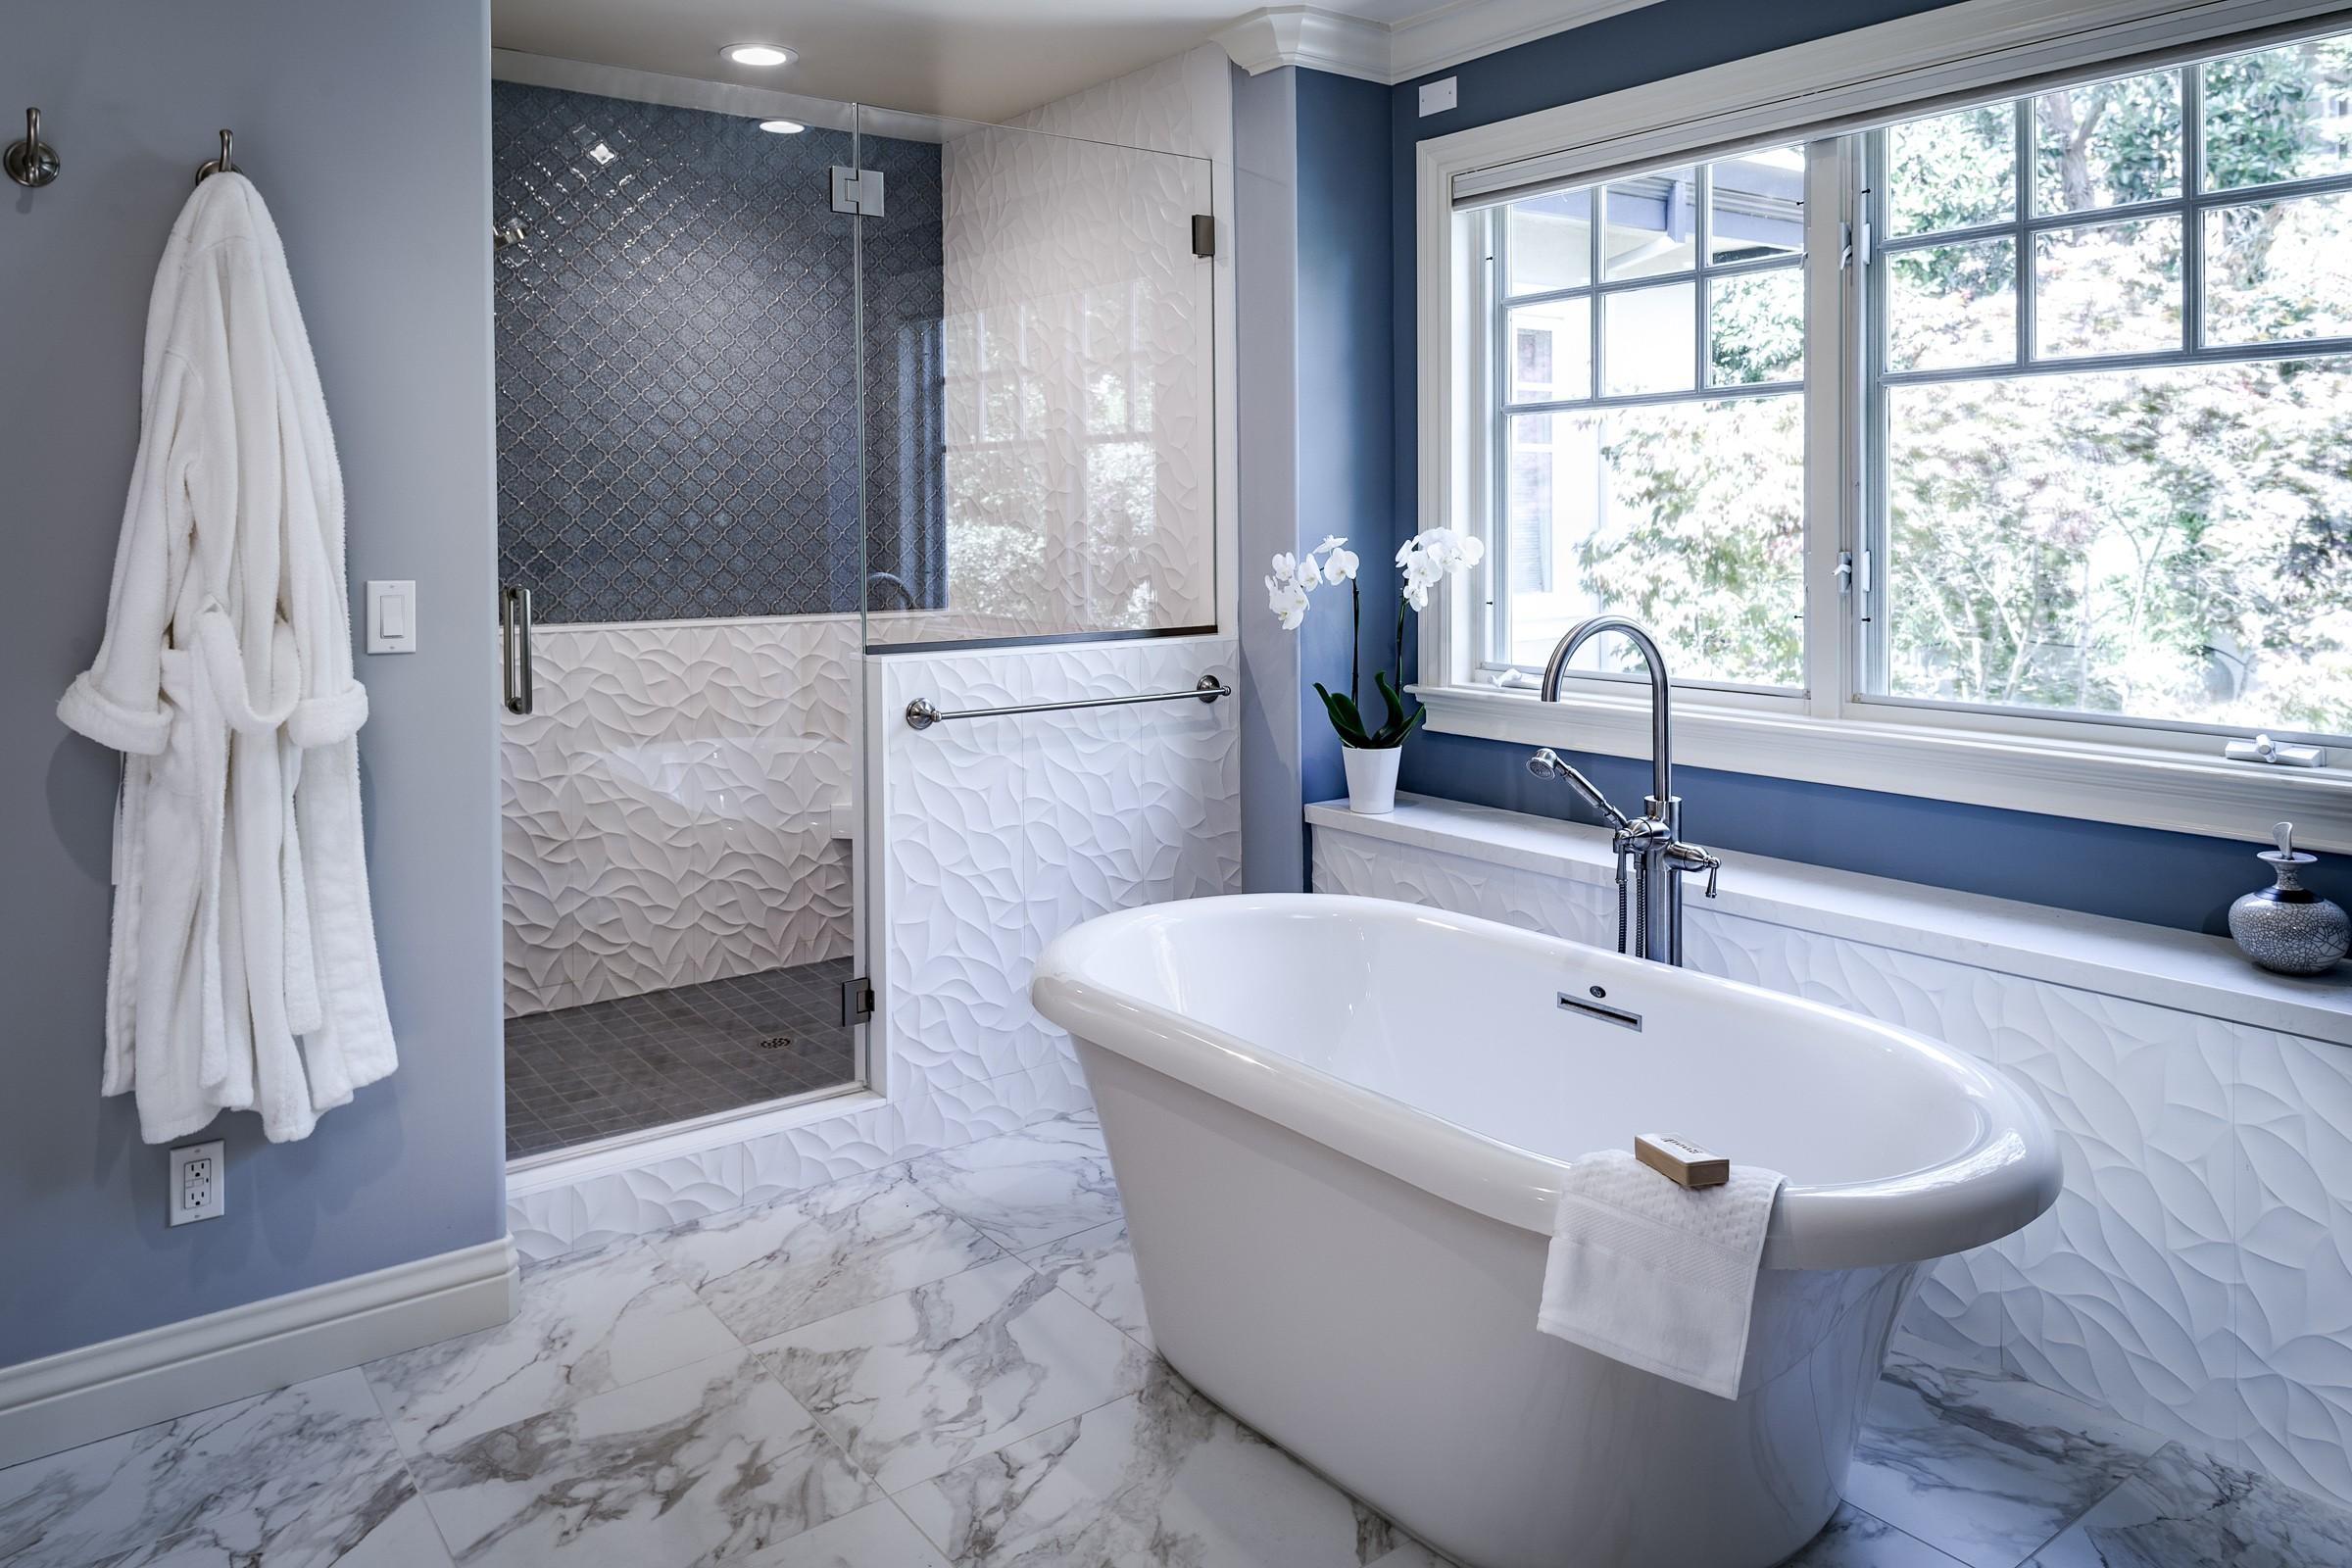 Award-Winning-Bathroom-Remodel-01